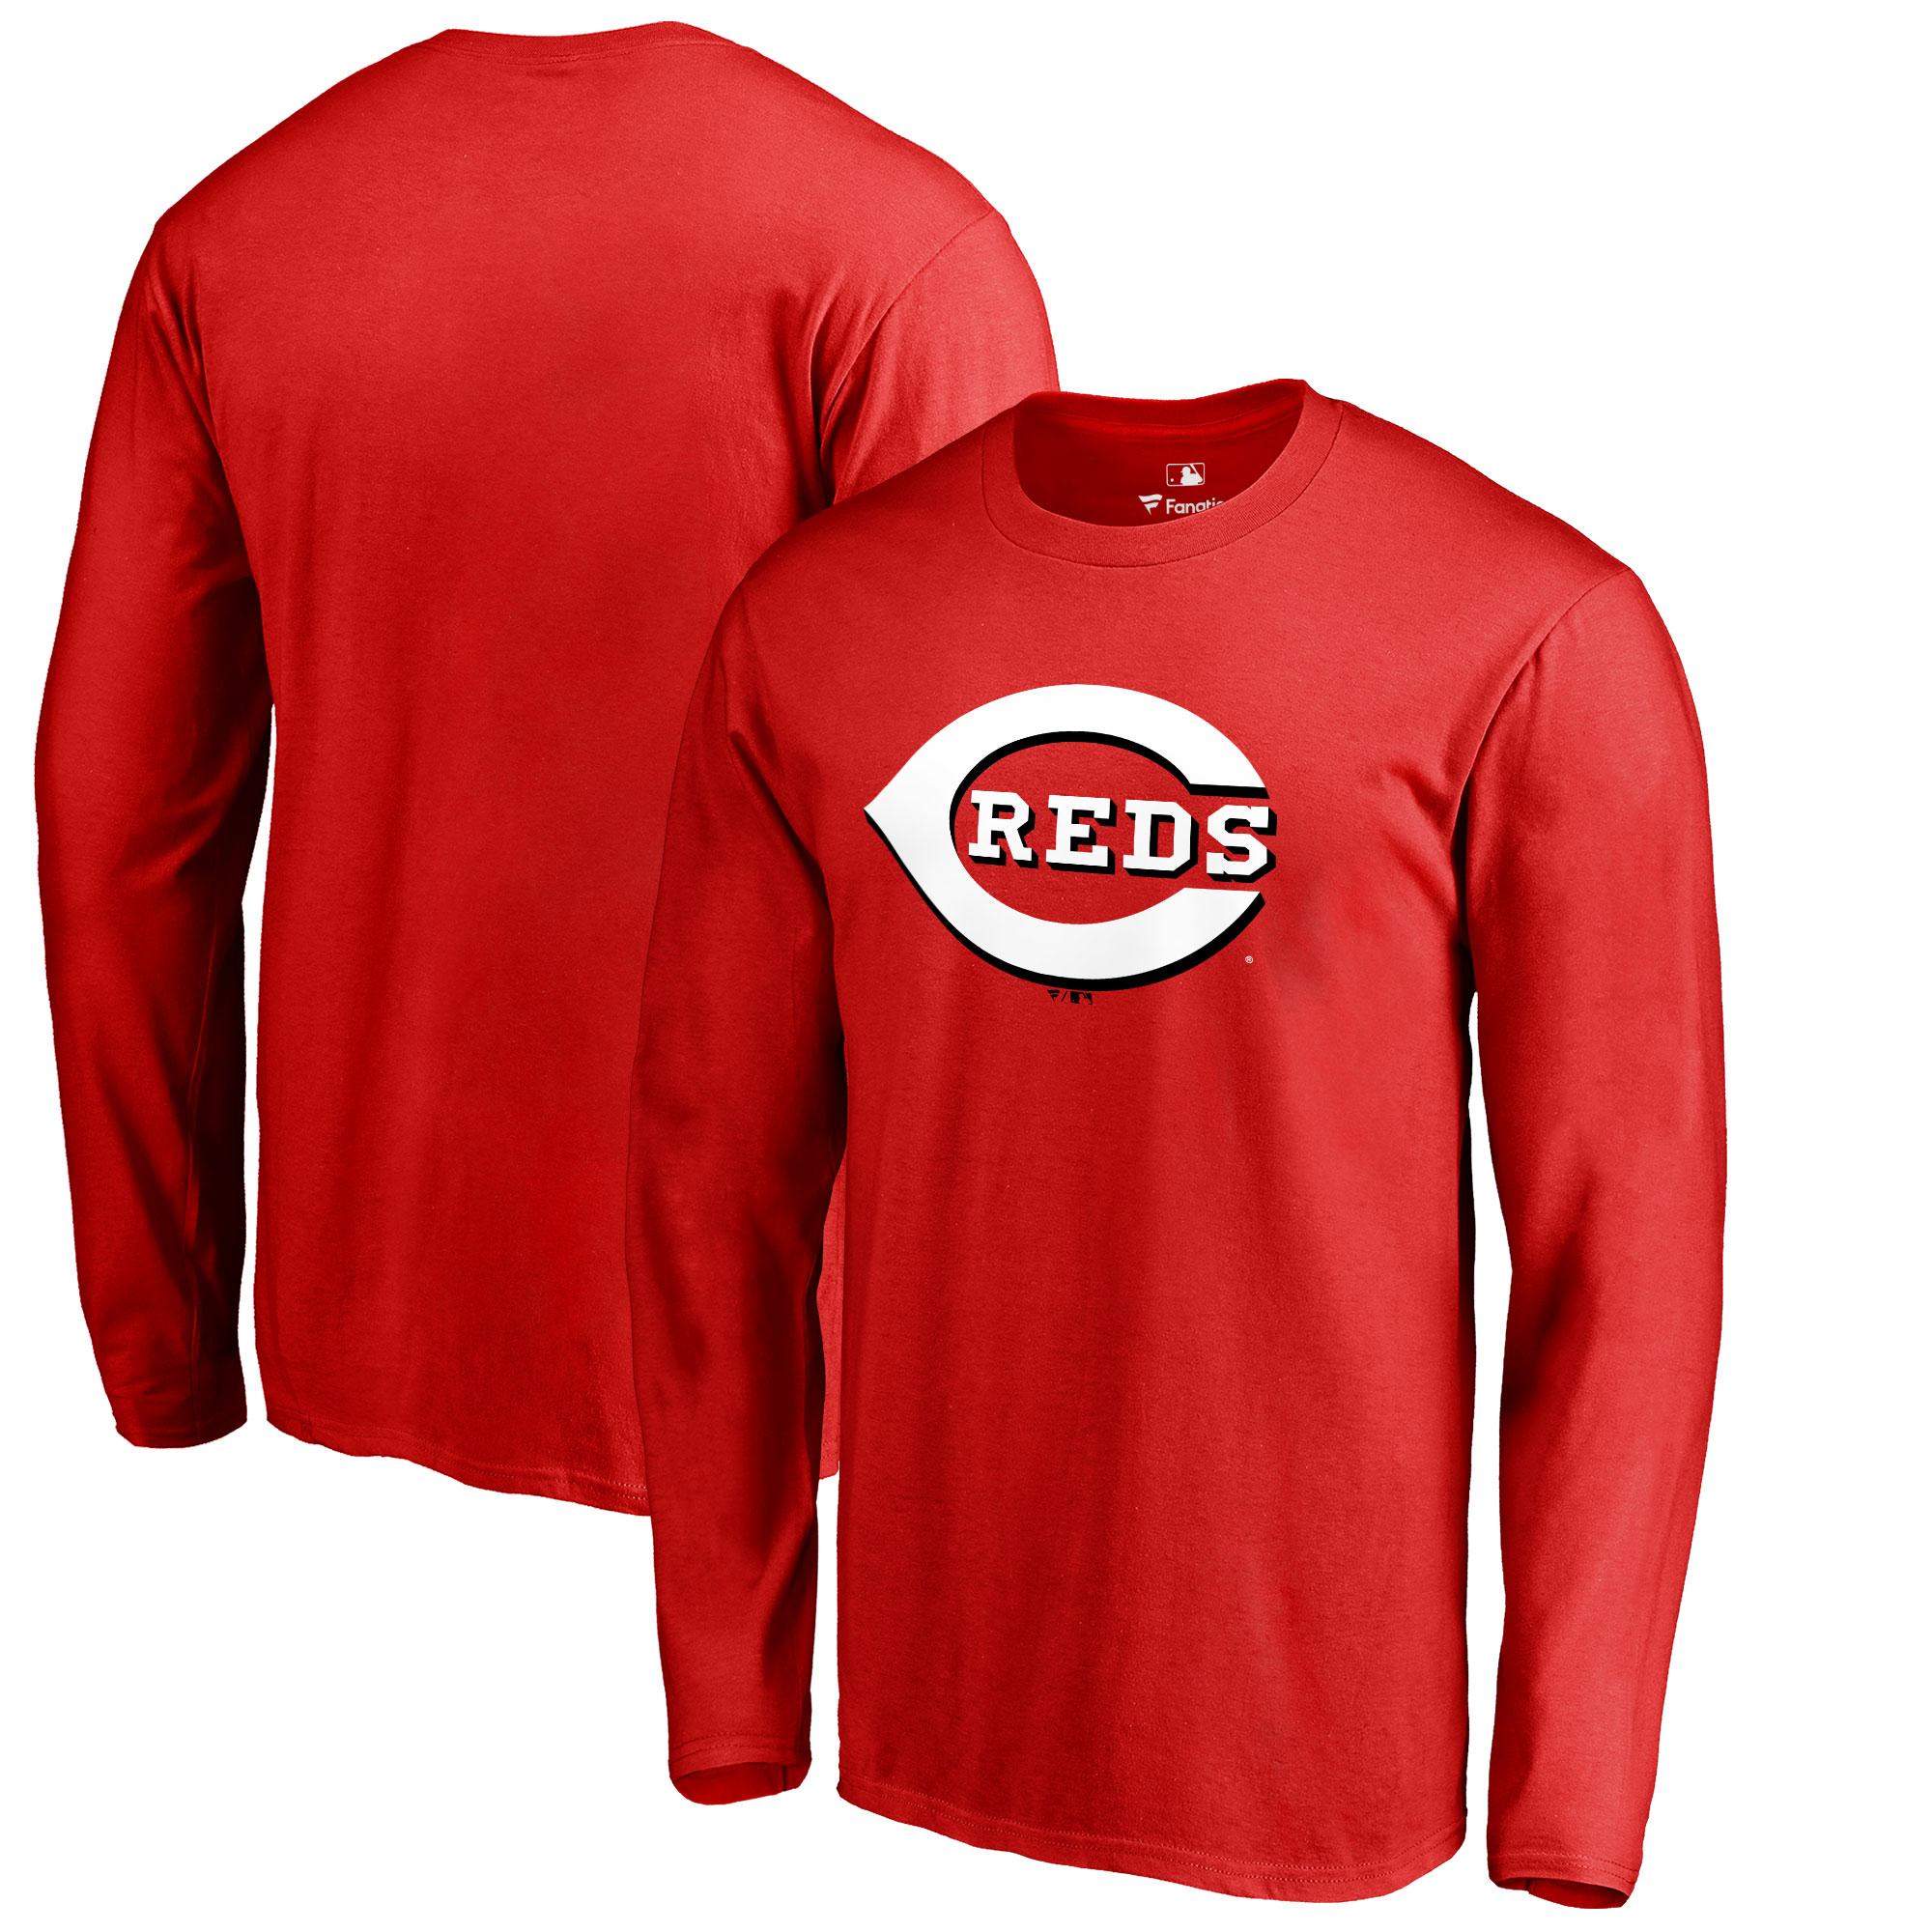 Cincinnati Reds Big & Tall Primary Team Logo Long Sleeve T-Shirt - Red